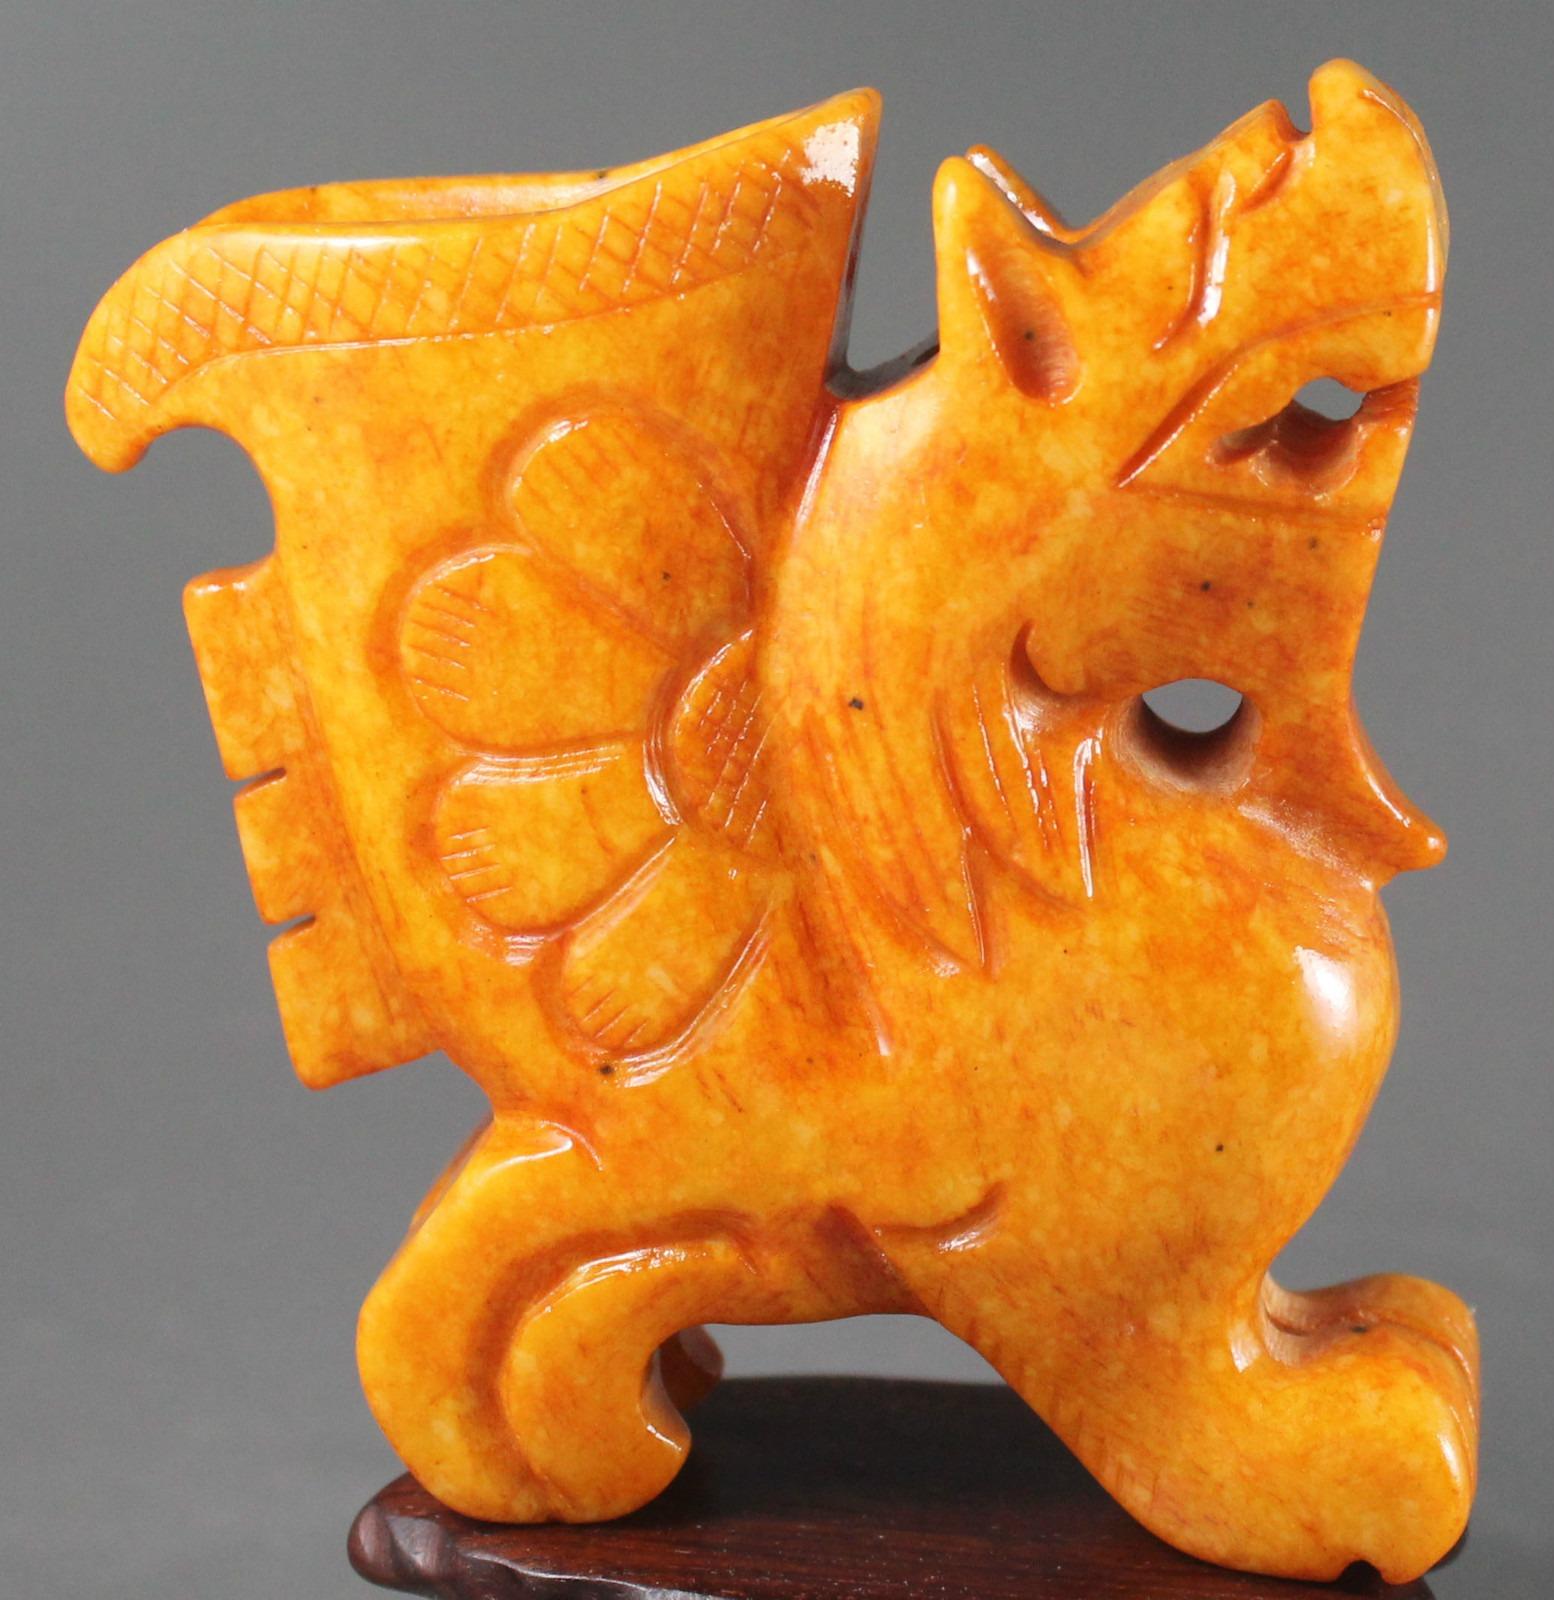 China Qing Dynasty Antique Artifact (18th c)